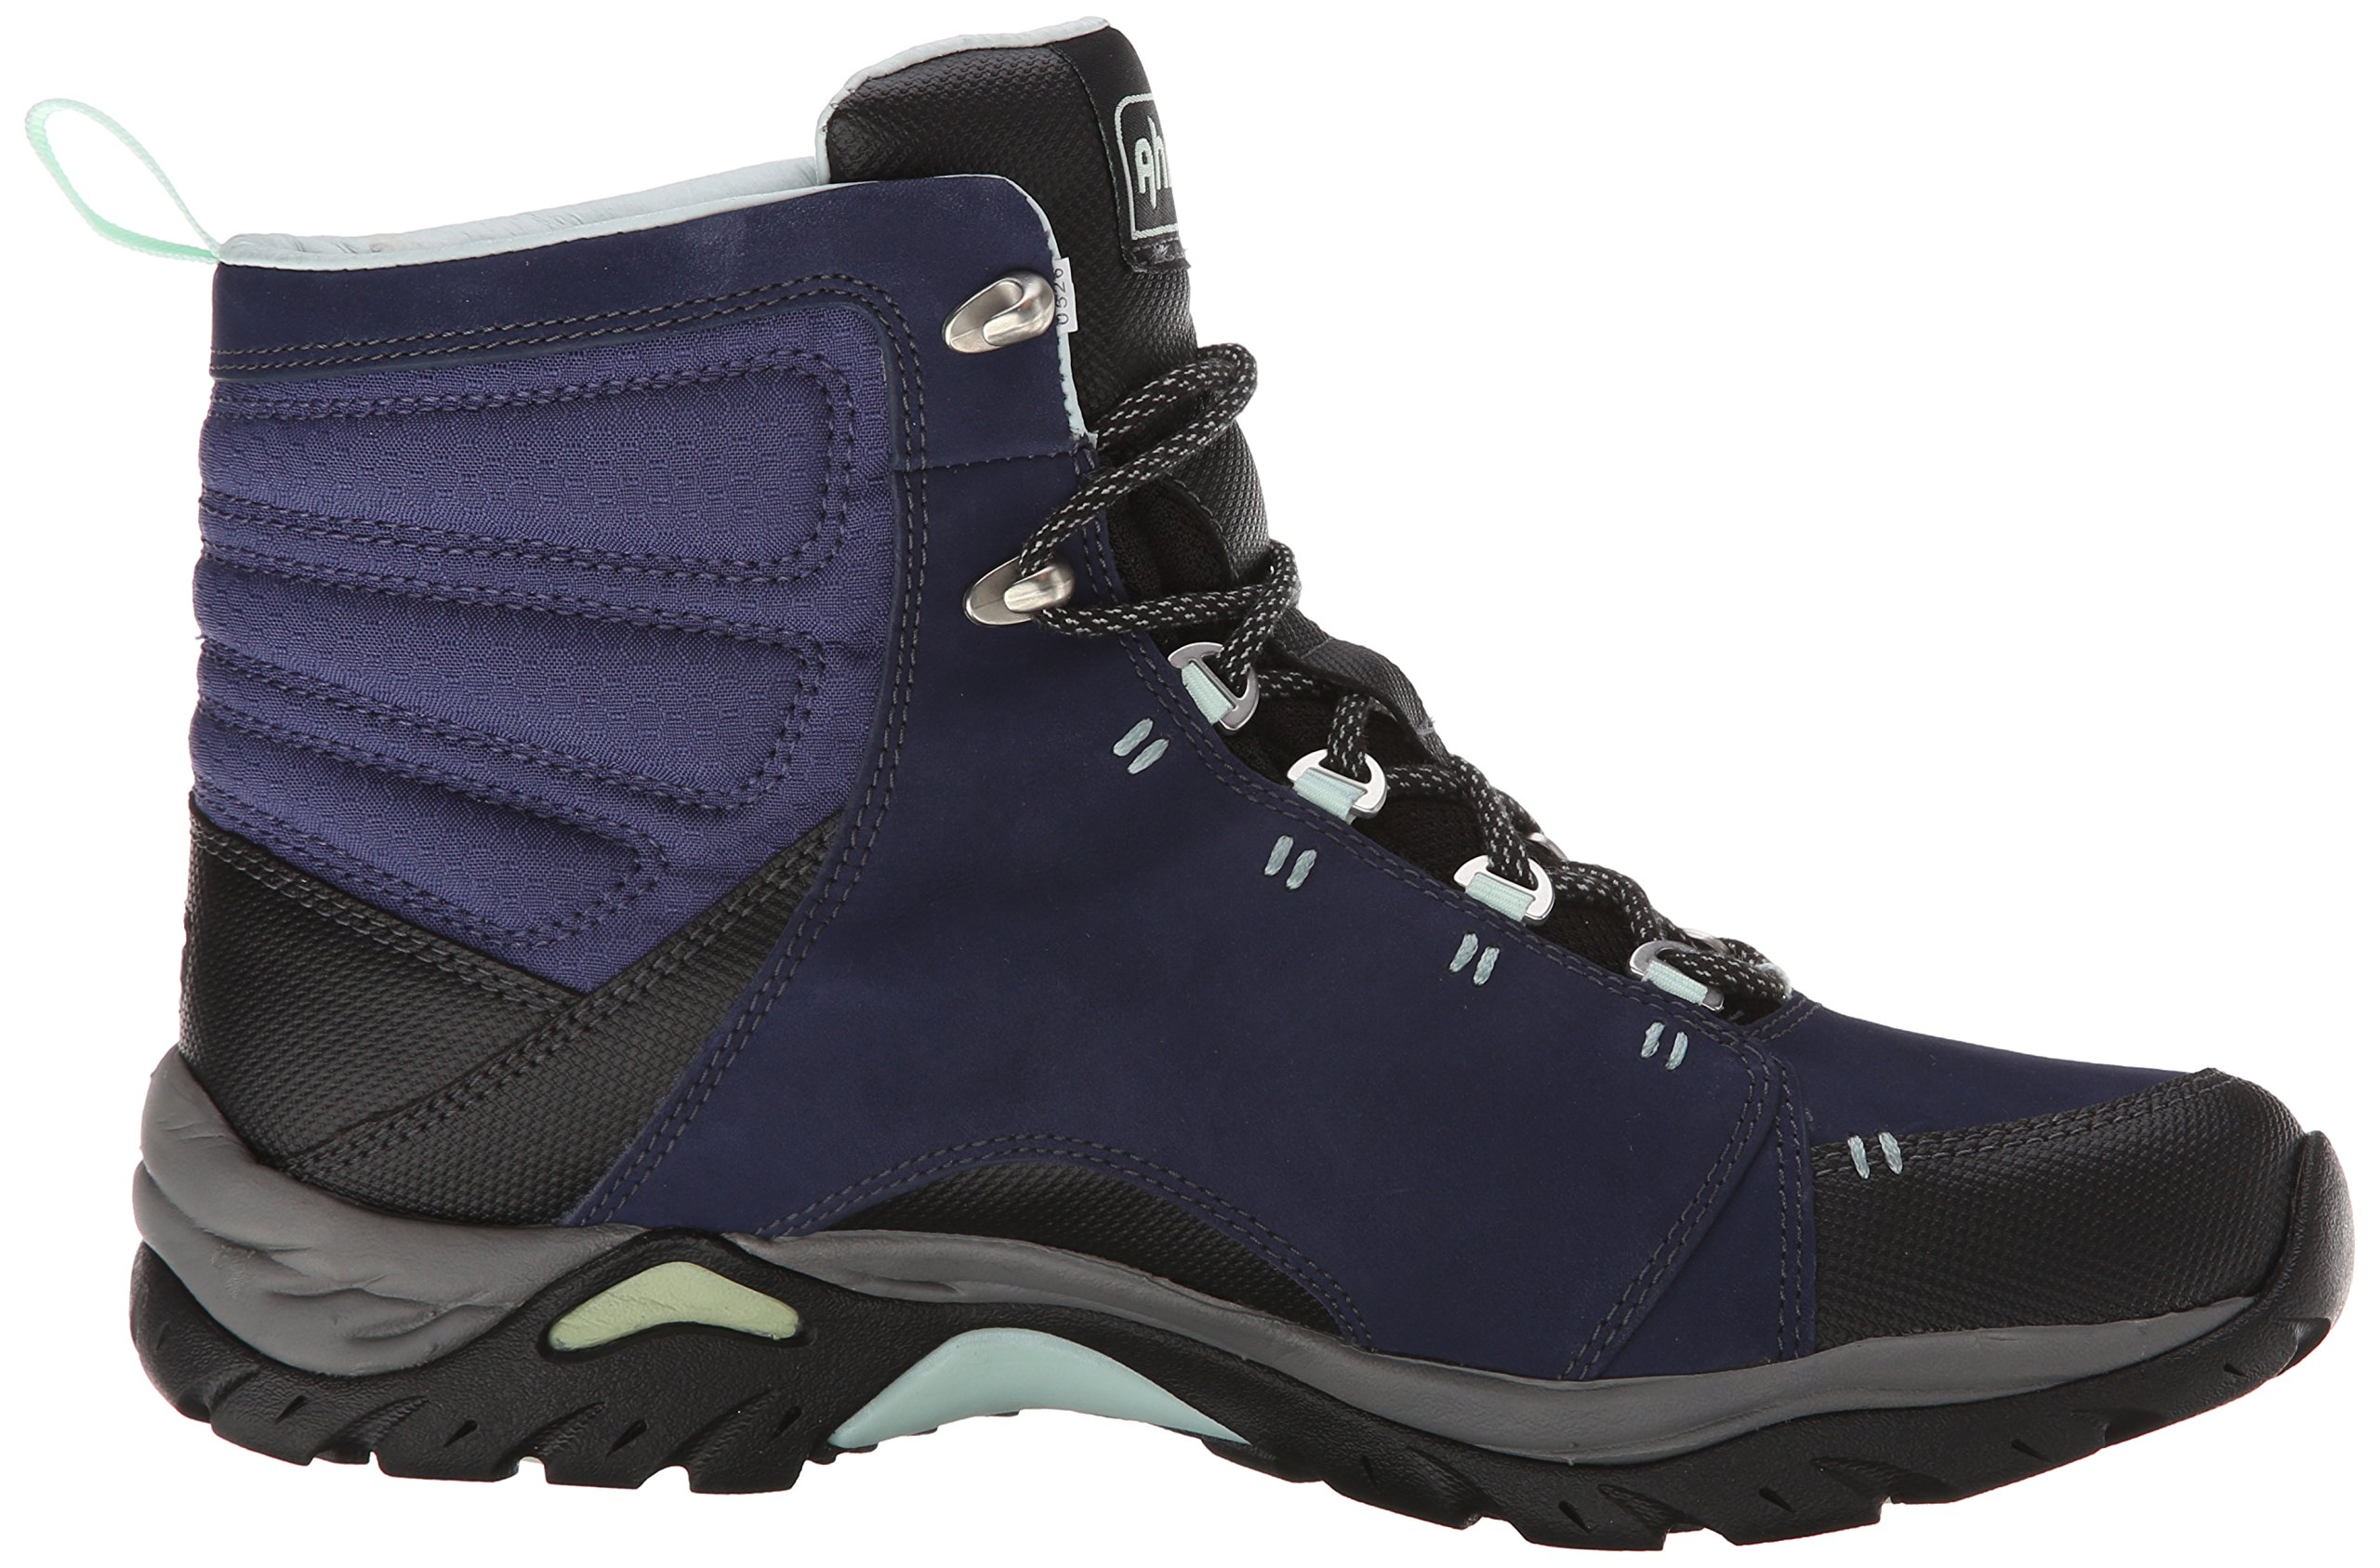 Ahnu Women's Montara Waterproof Boot,Midnight Blue,8 M US by Ahnu (Image #7)